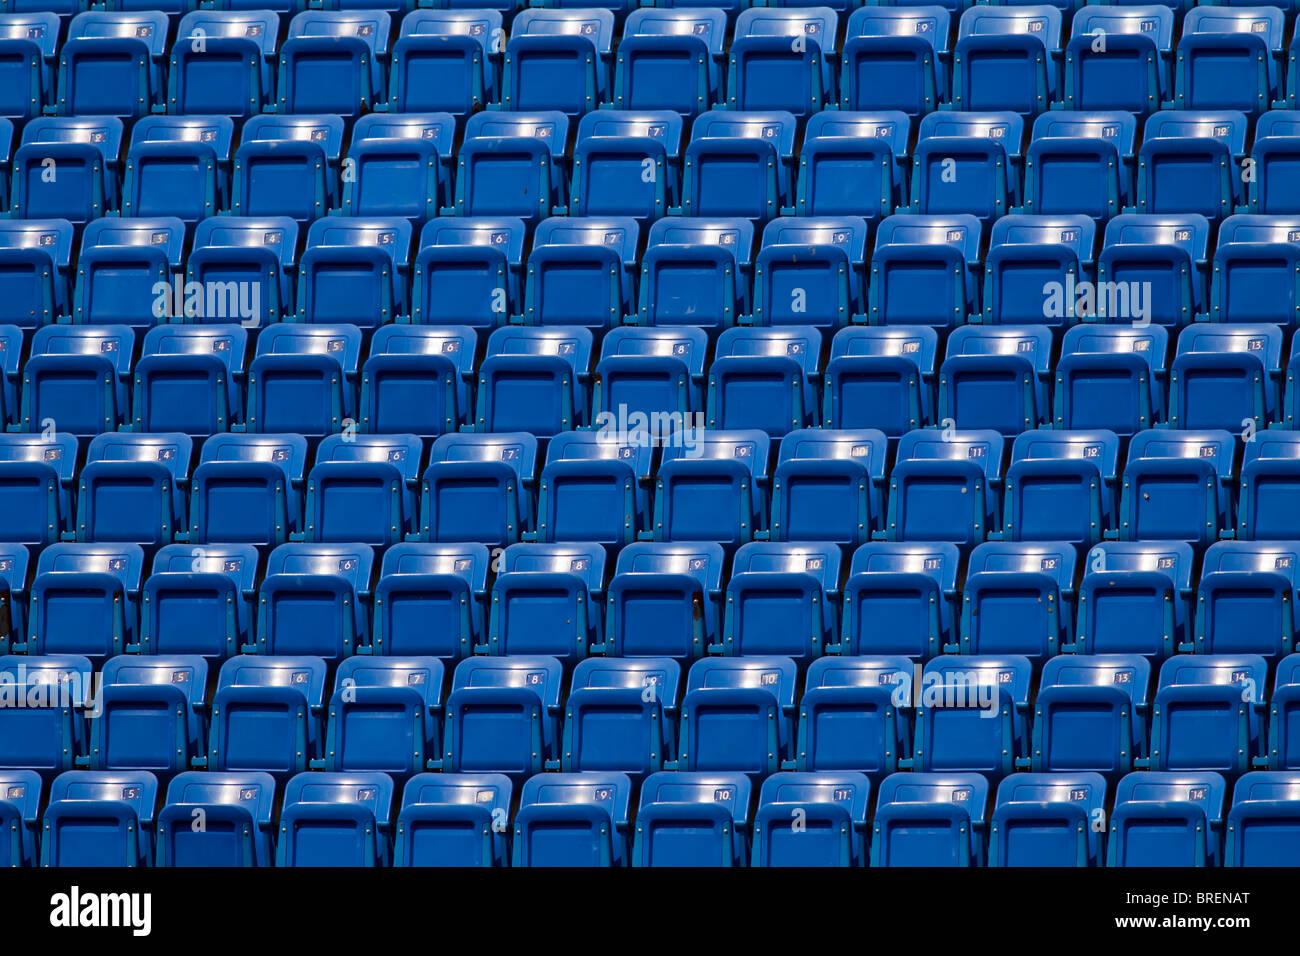 Empty Stadium Seating. - Stock Image